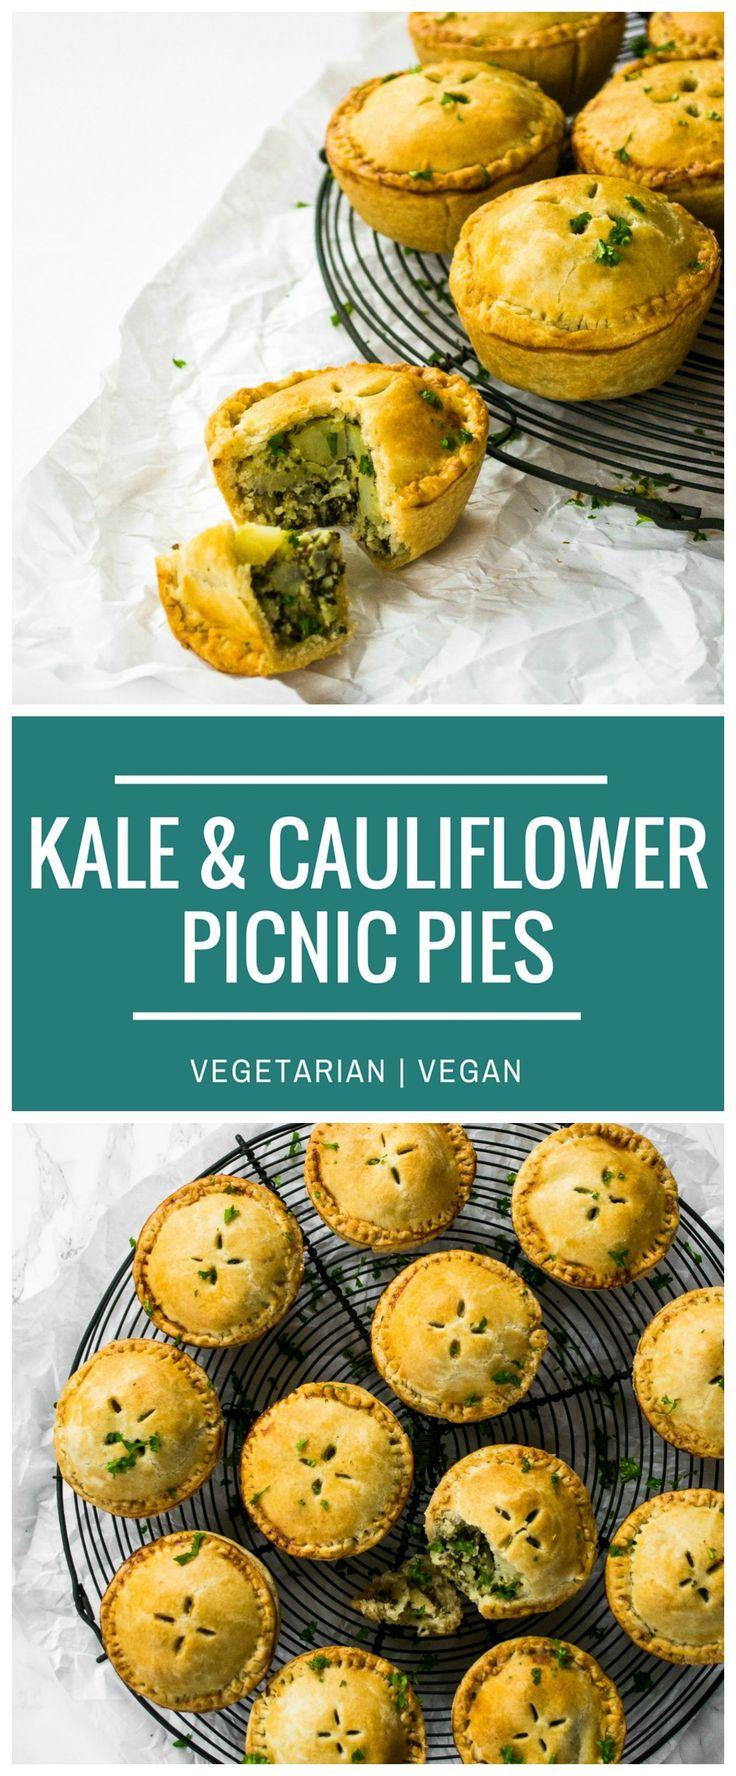 Kale and cauliflower picnic pies